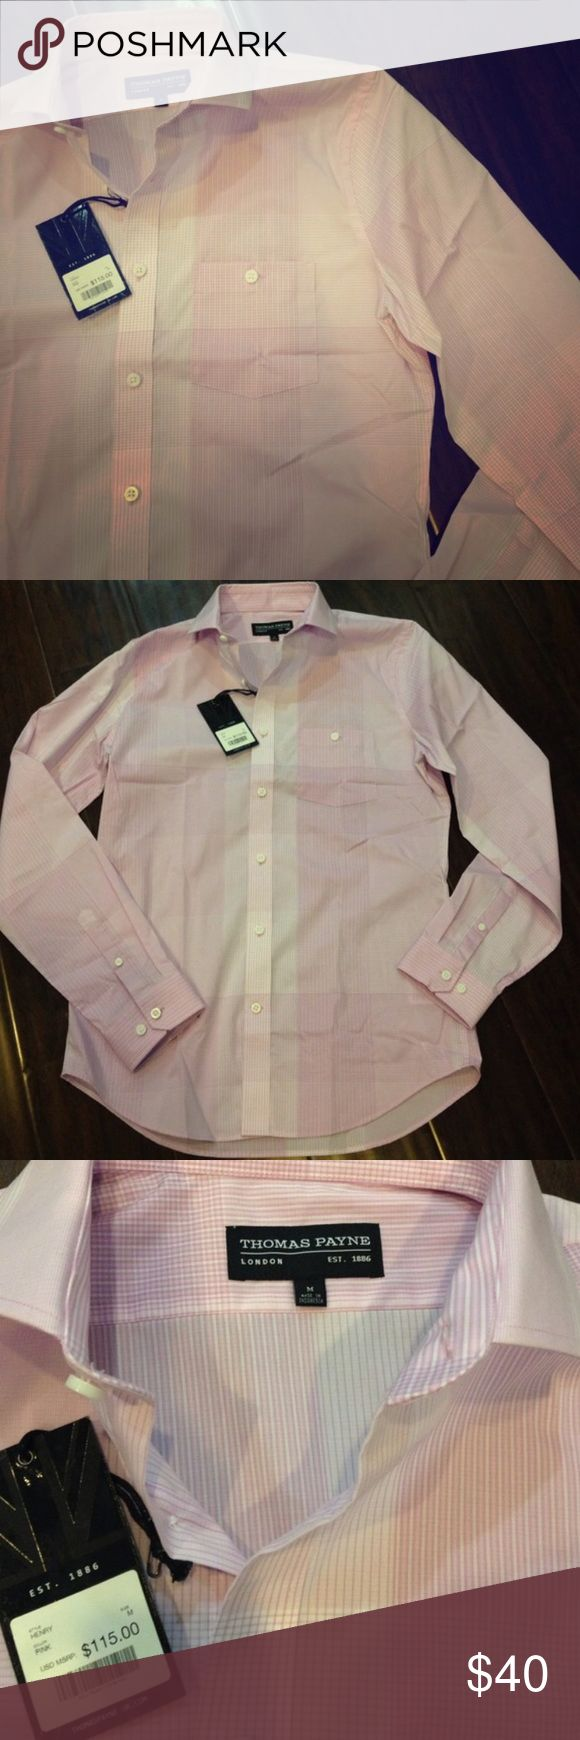 Thomas Payne Dress Shirt Pink plaids Dress Shirt Thomas payne Shirts Dress Shirts